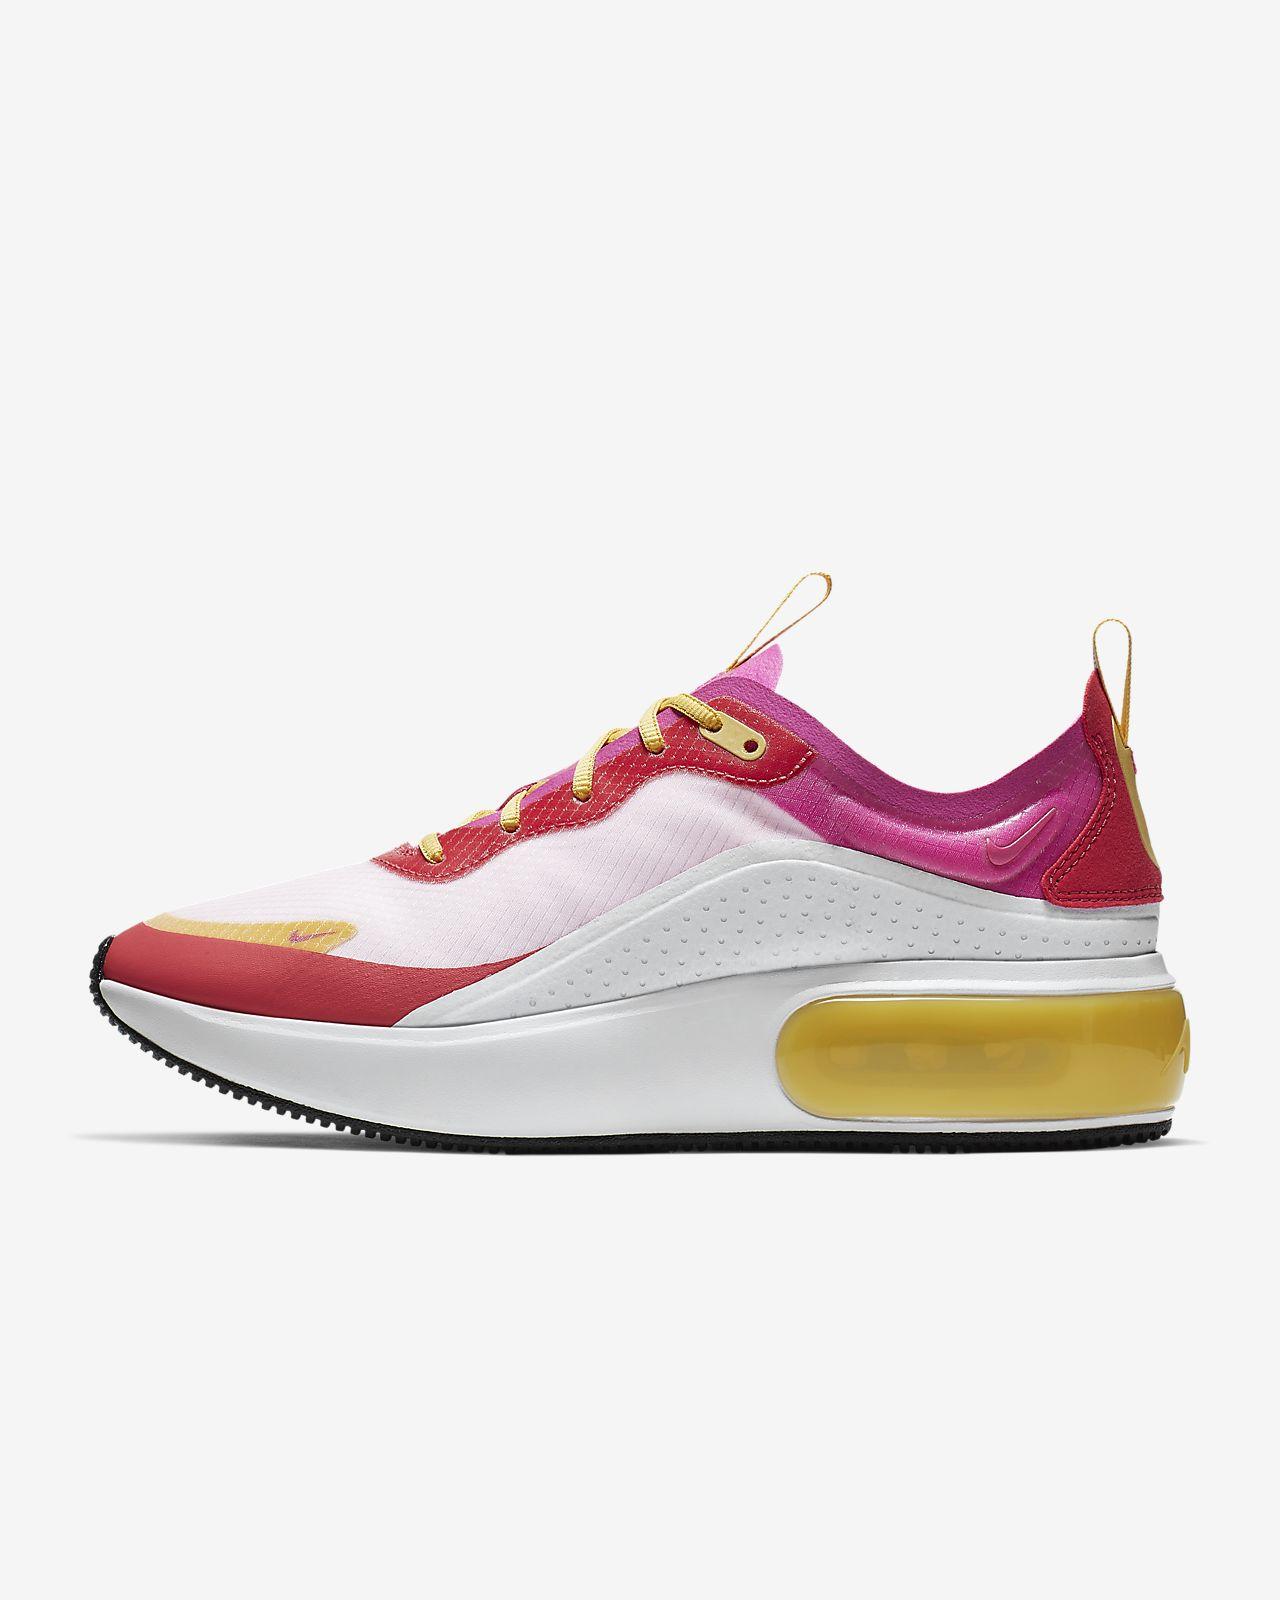 online store 6c467 13fb0 ... Chaussure Nike Air Max Dia SE